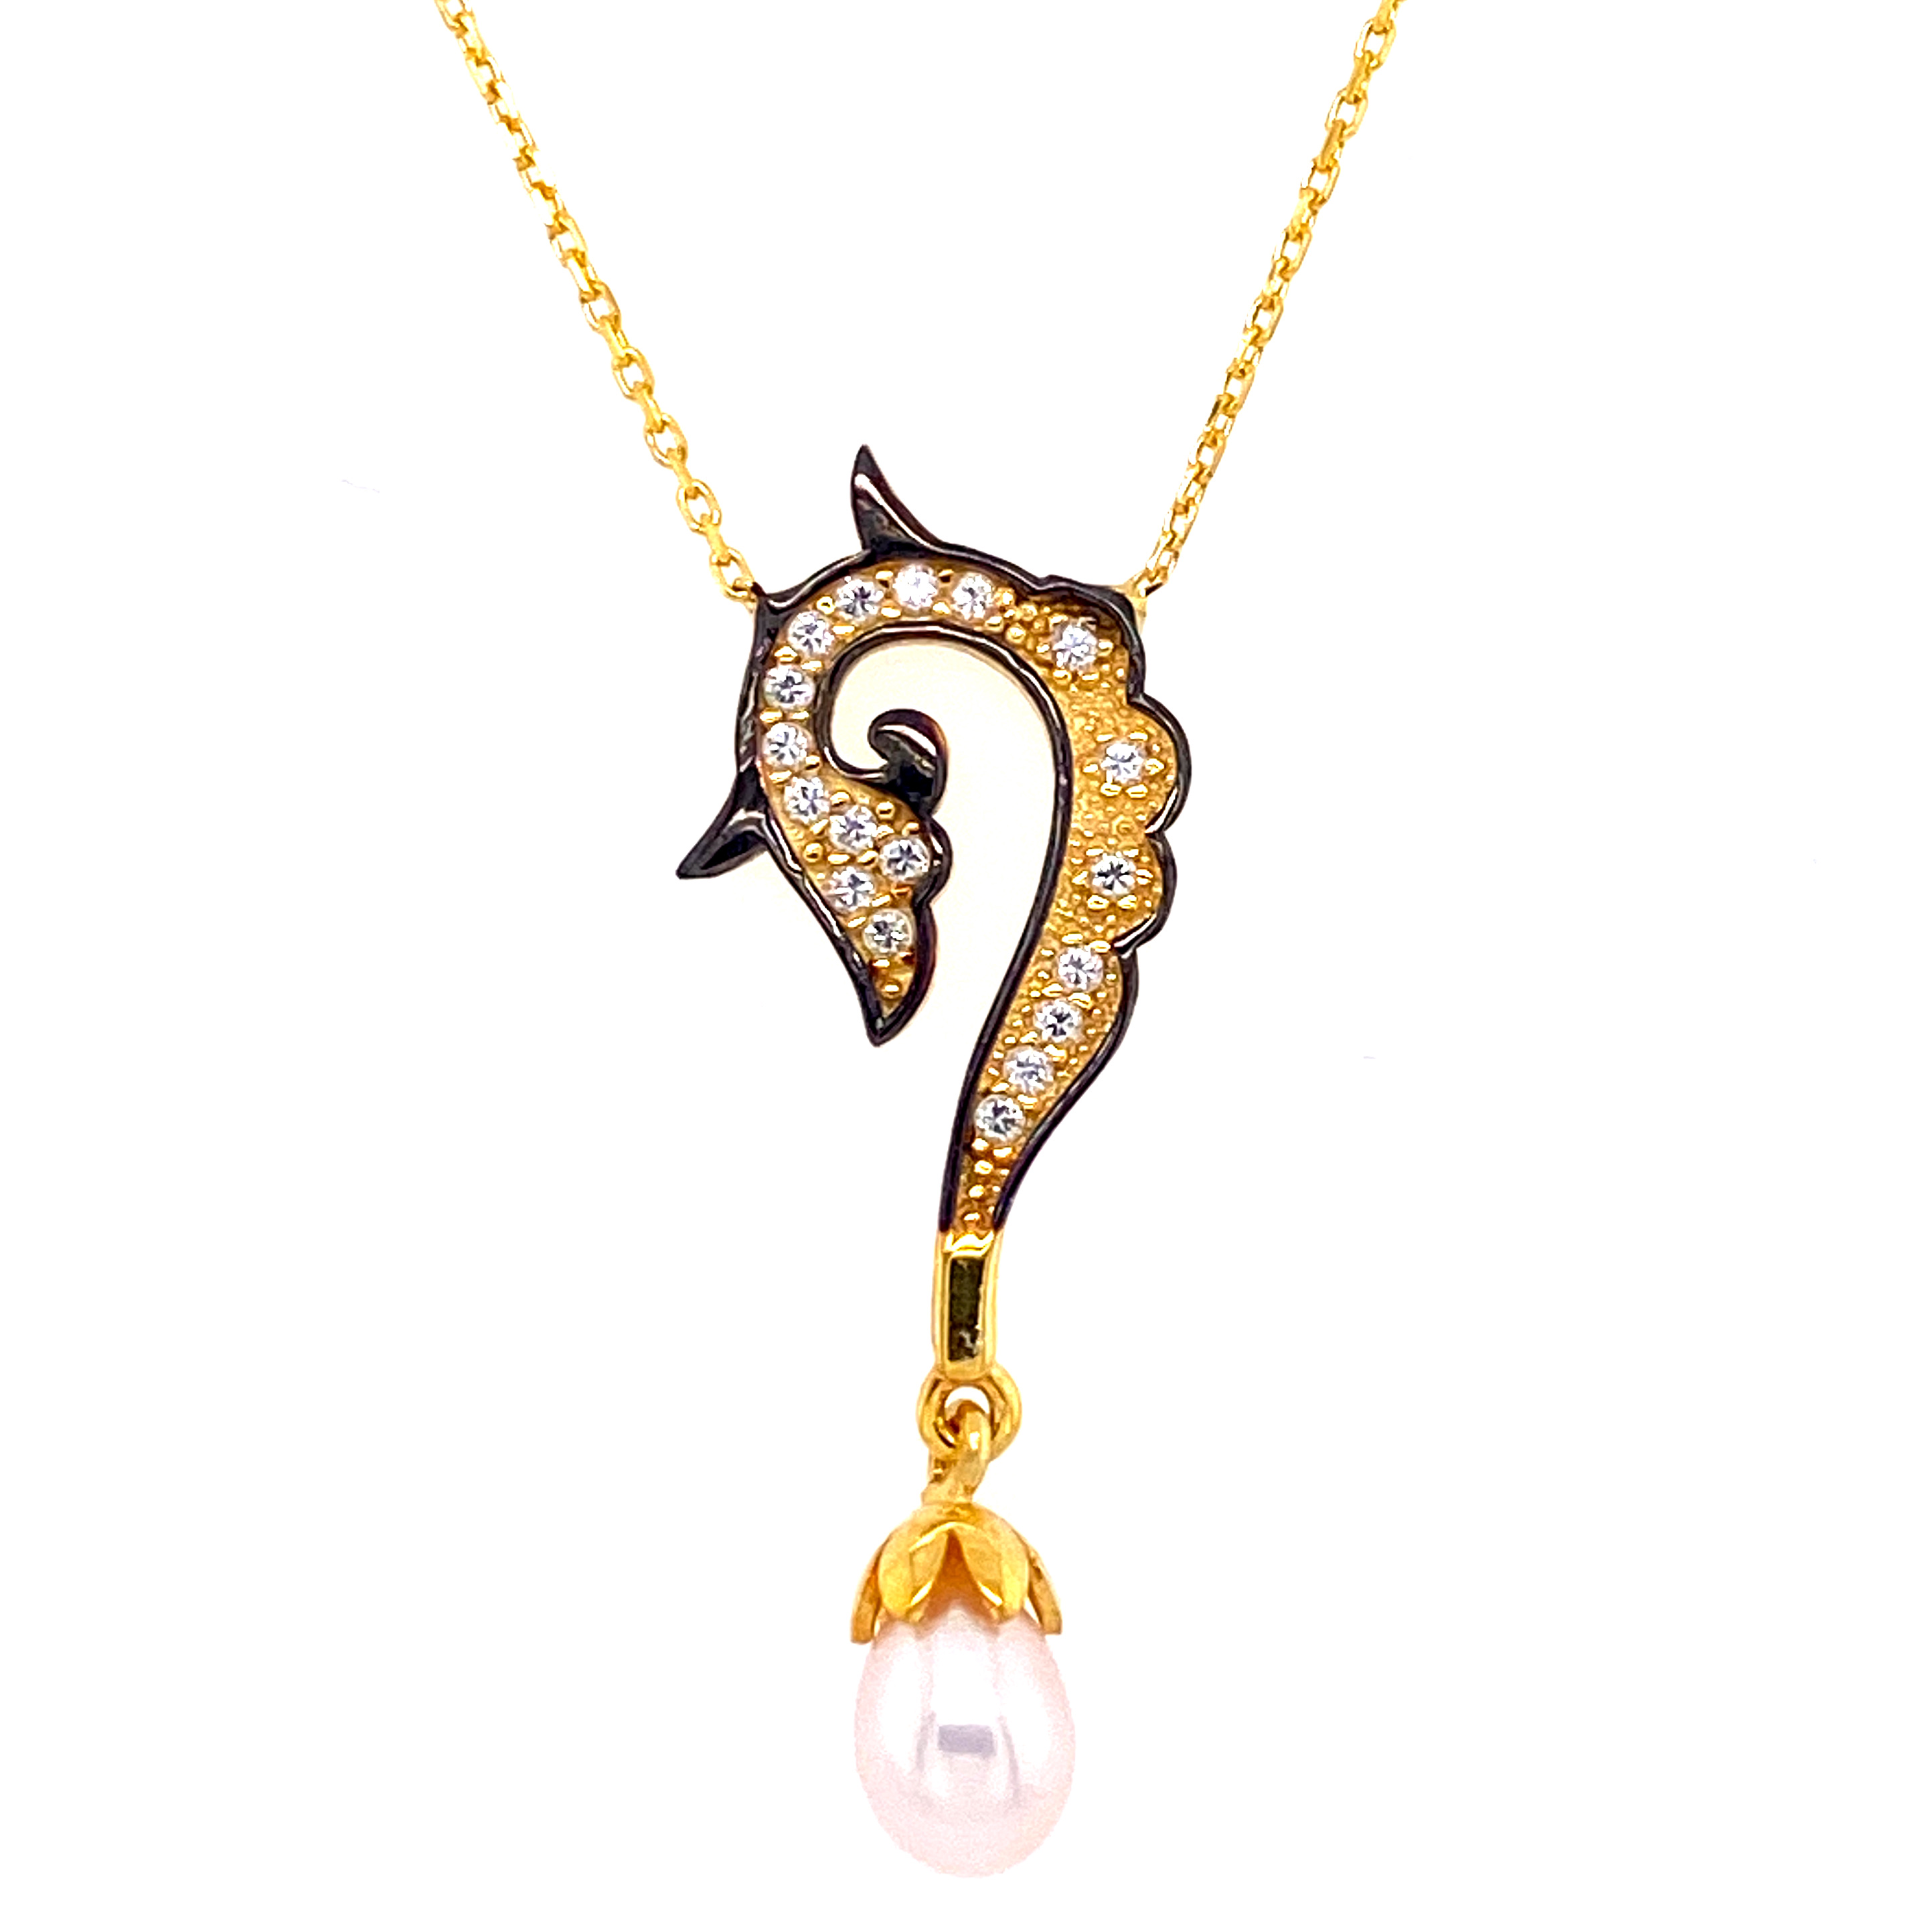 925 Silber Halskette | Seepferd Perle